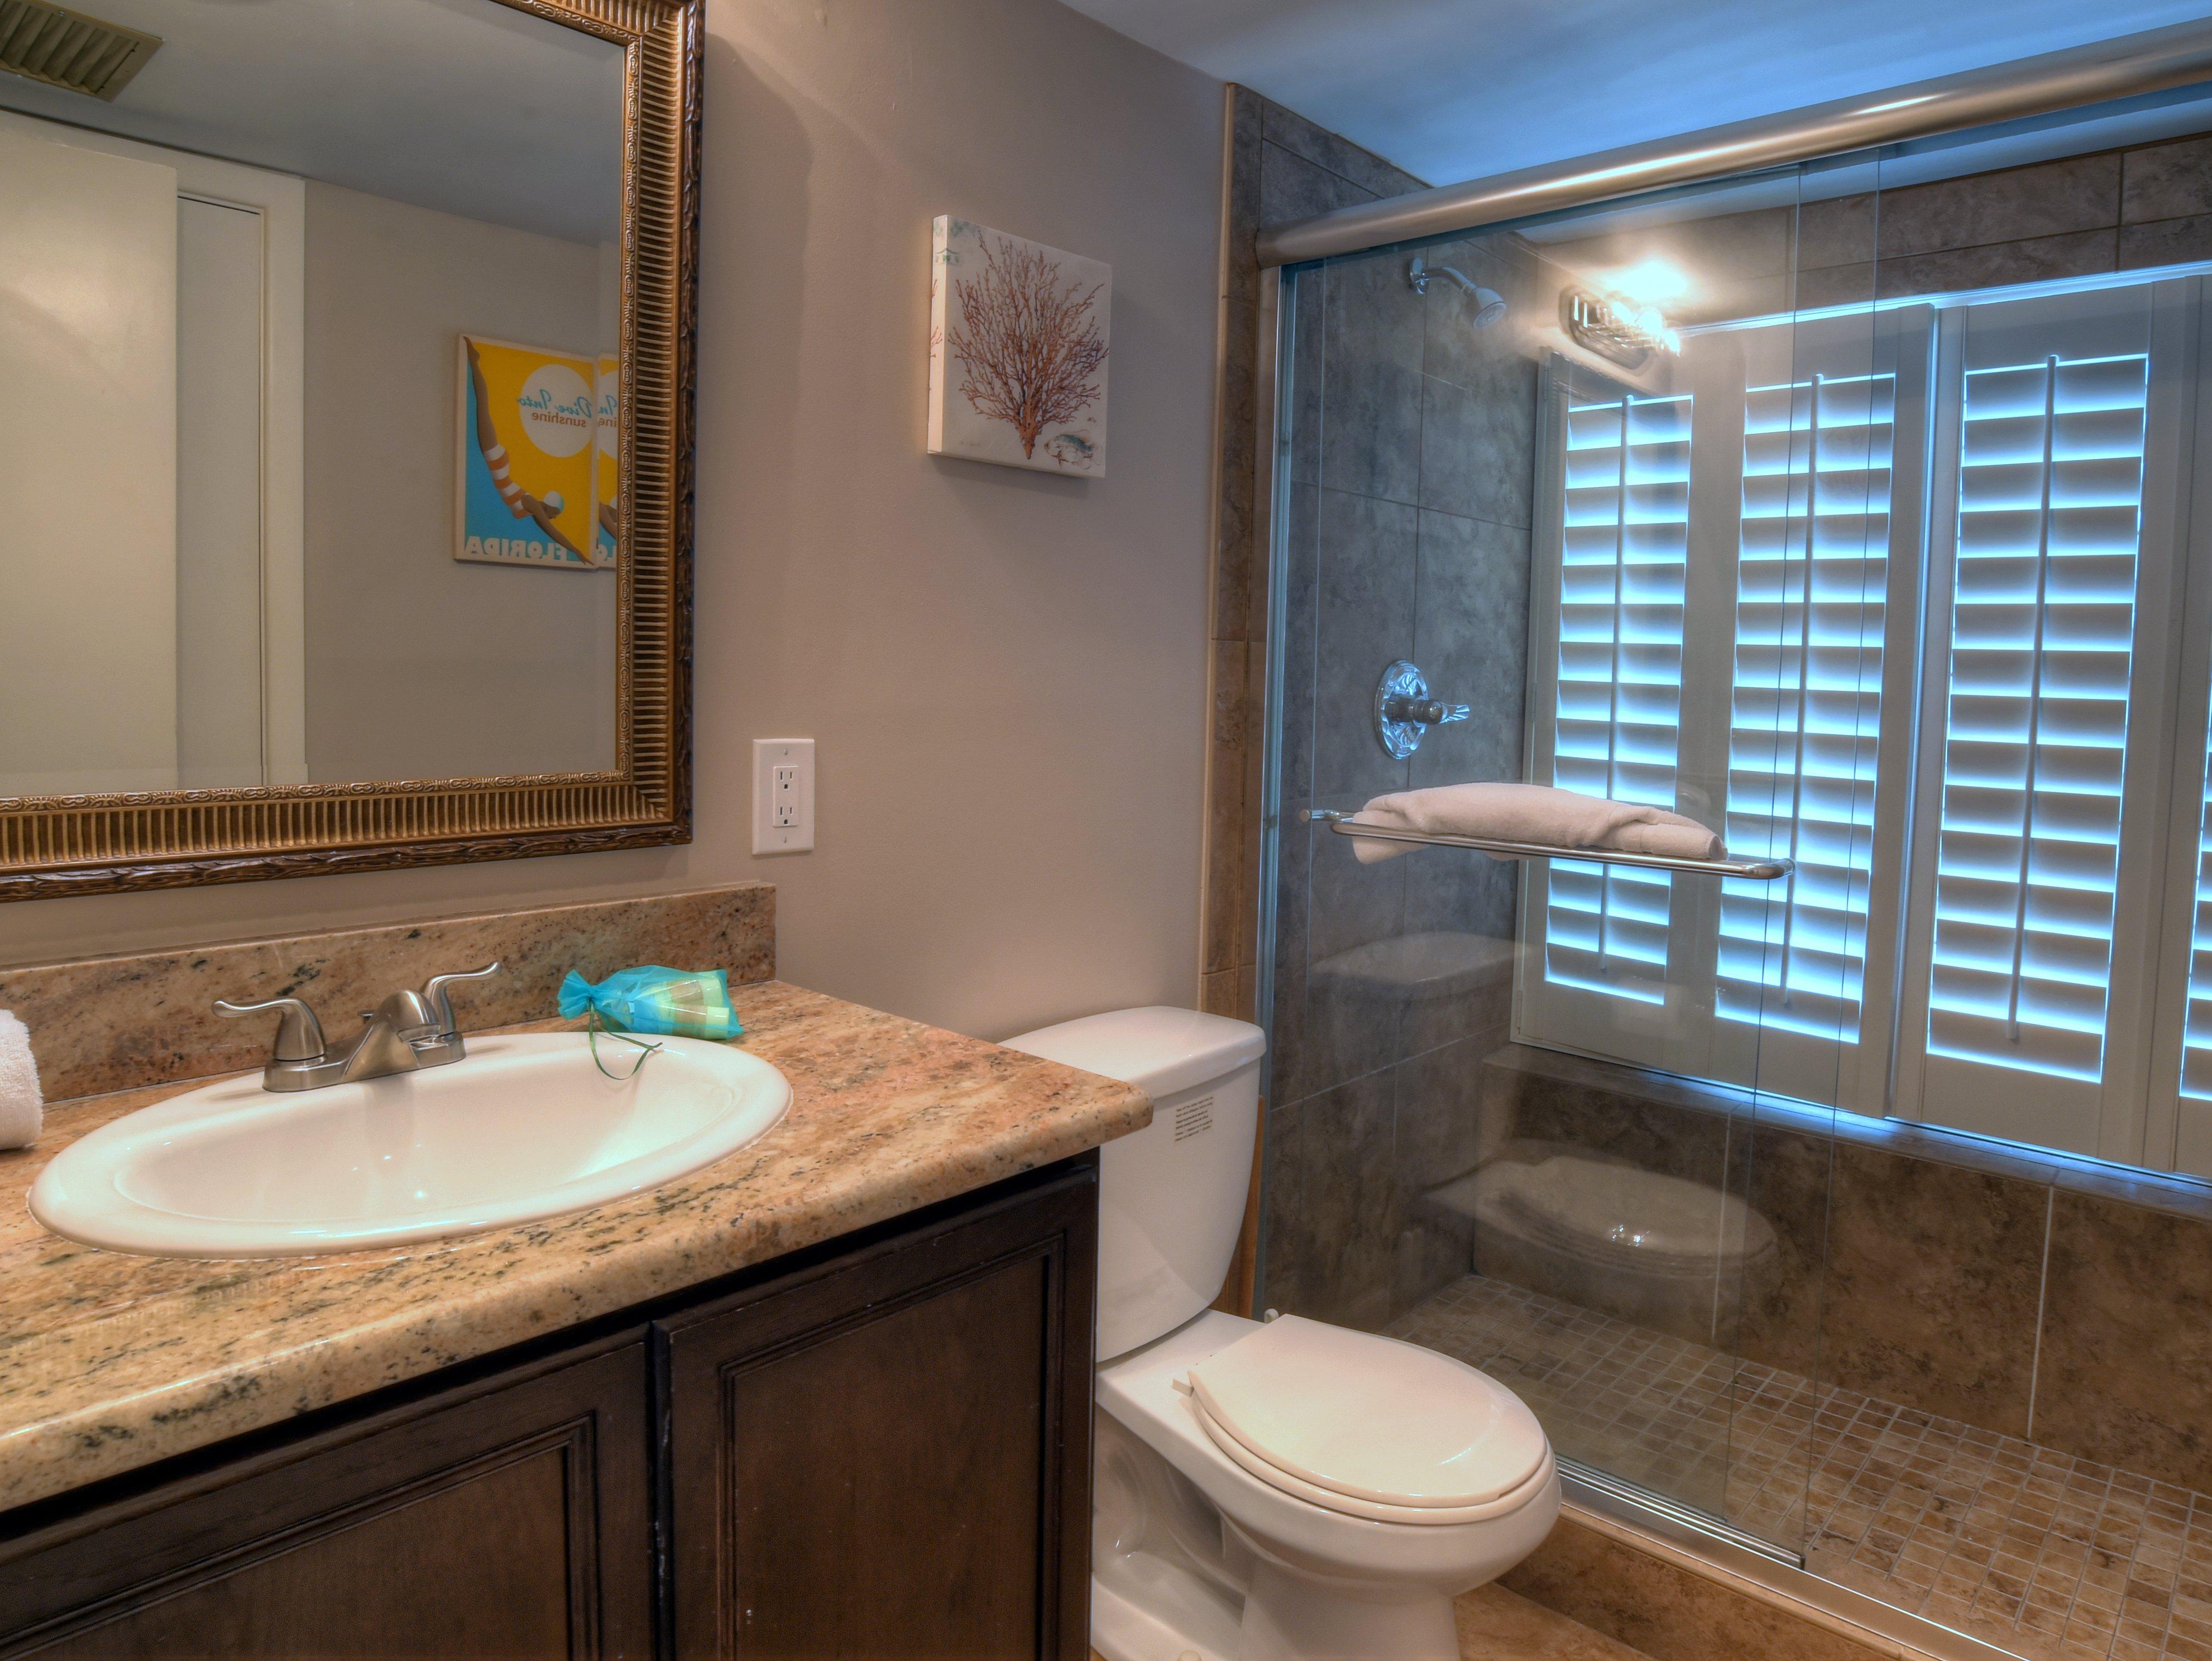 4362 Beachside Two Condo rental in Beachside Towers at Sandestin in Destin Florida - #18